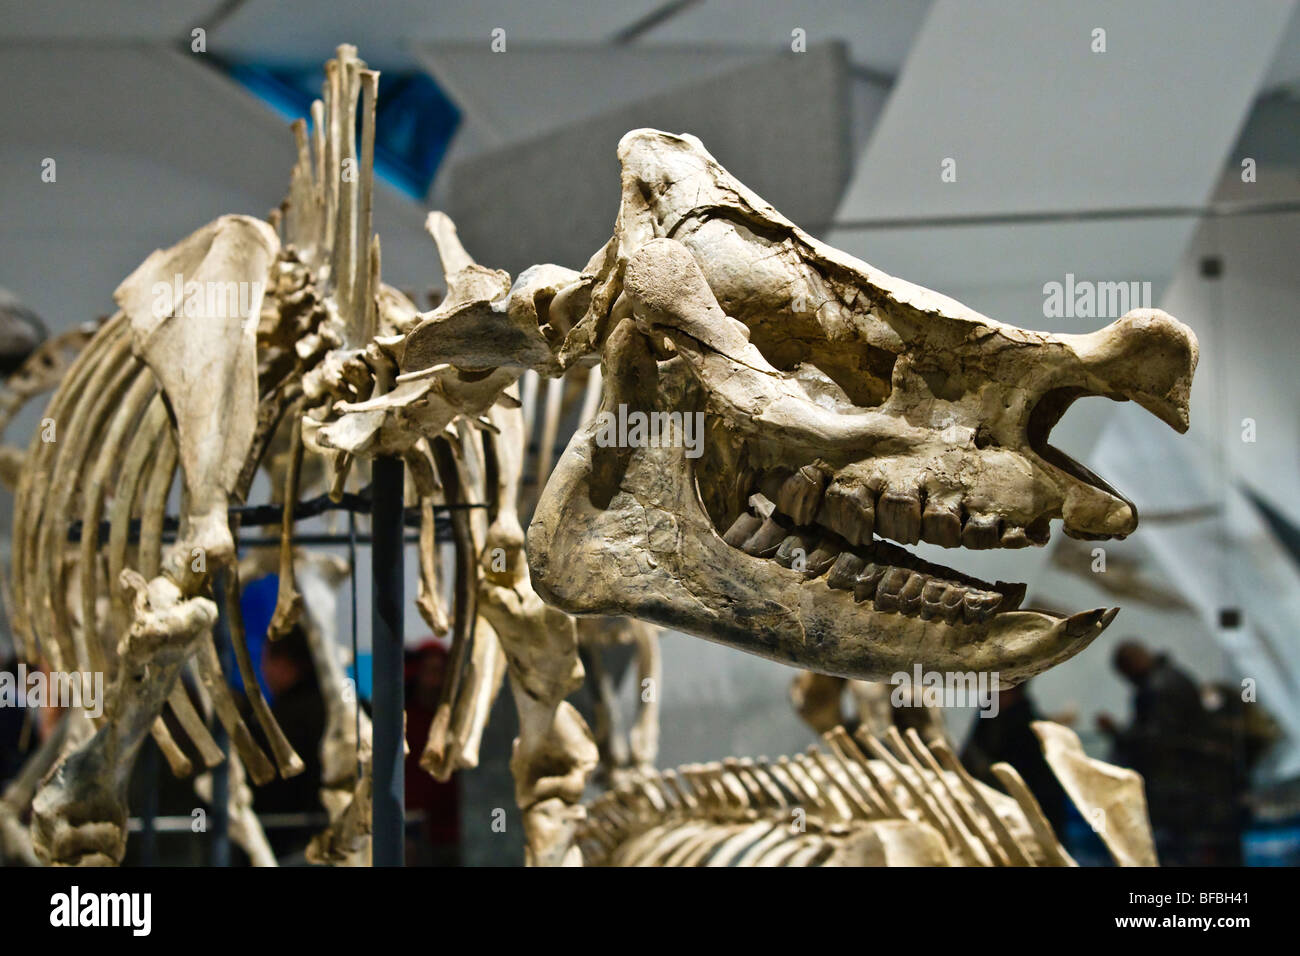 Extinct head and rhino skeleton, Scientific Name: Menoceras arikarense, Early Miocene Epoch, 20 million years old - Stock Image